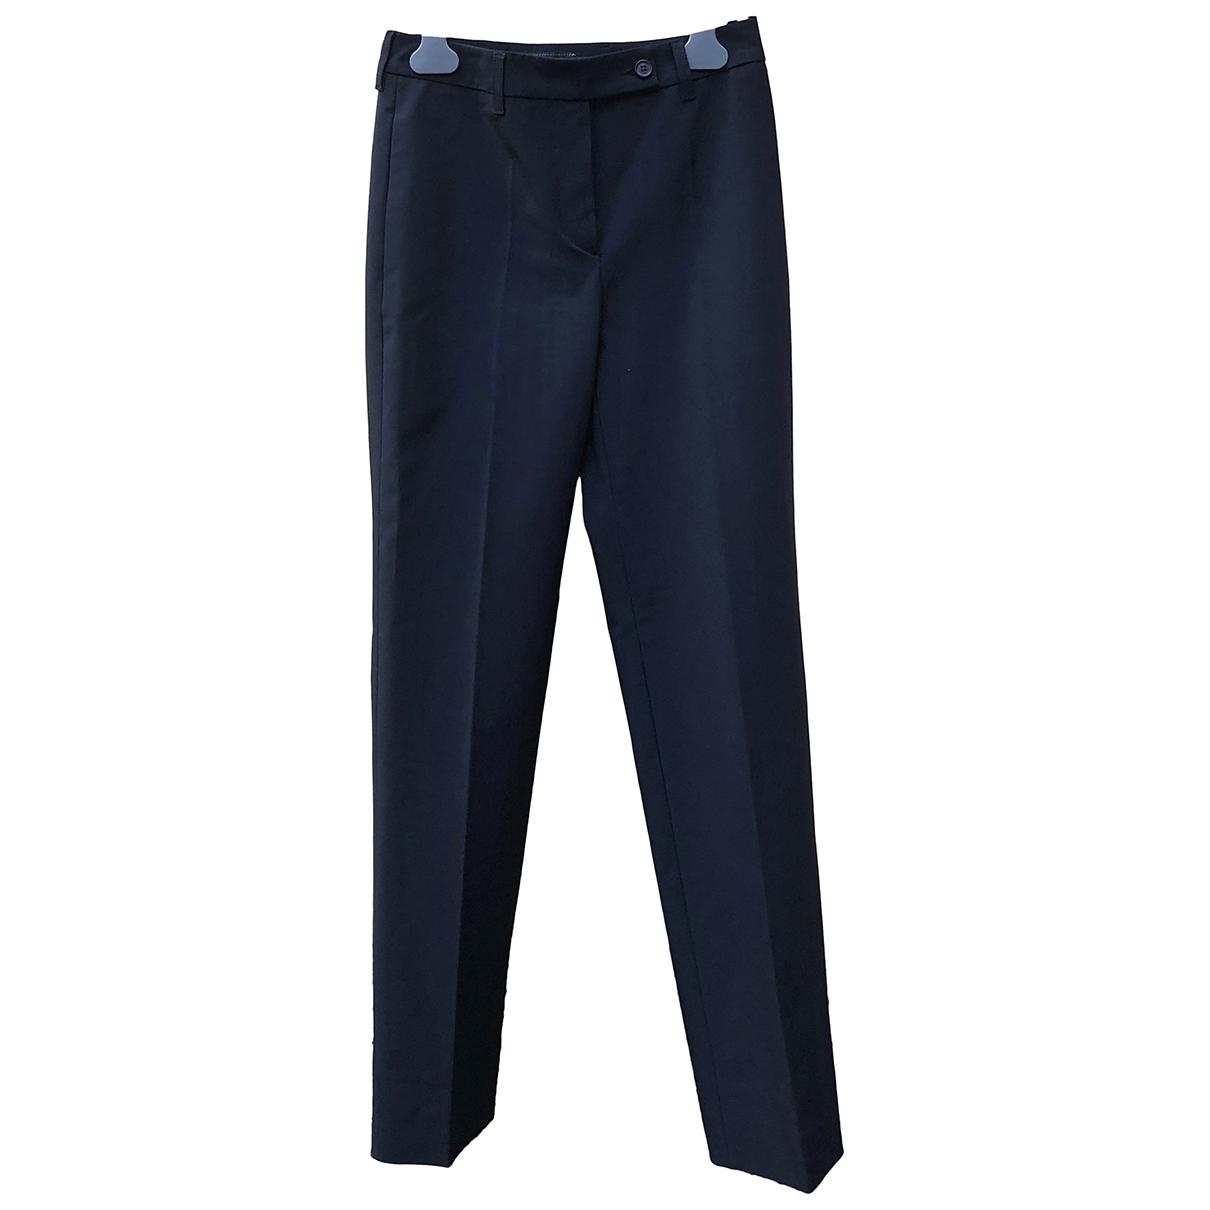 Prada \N Black Trousers for Women 38 IT